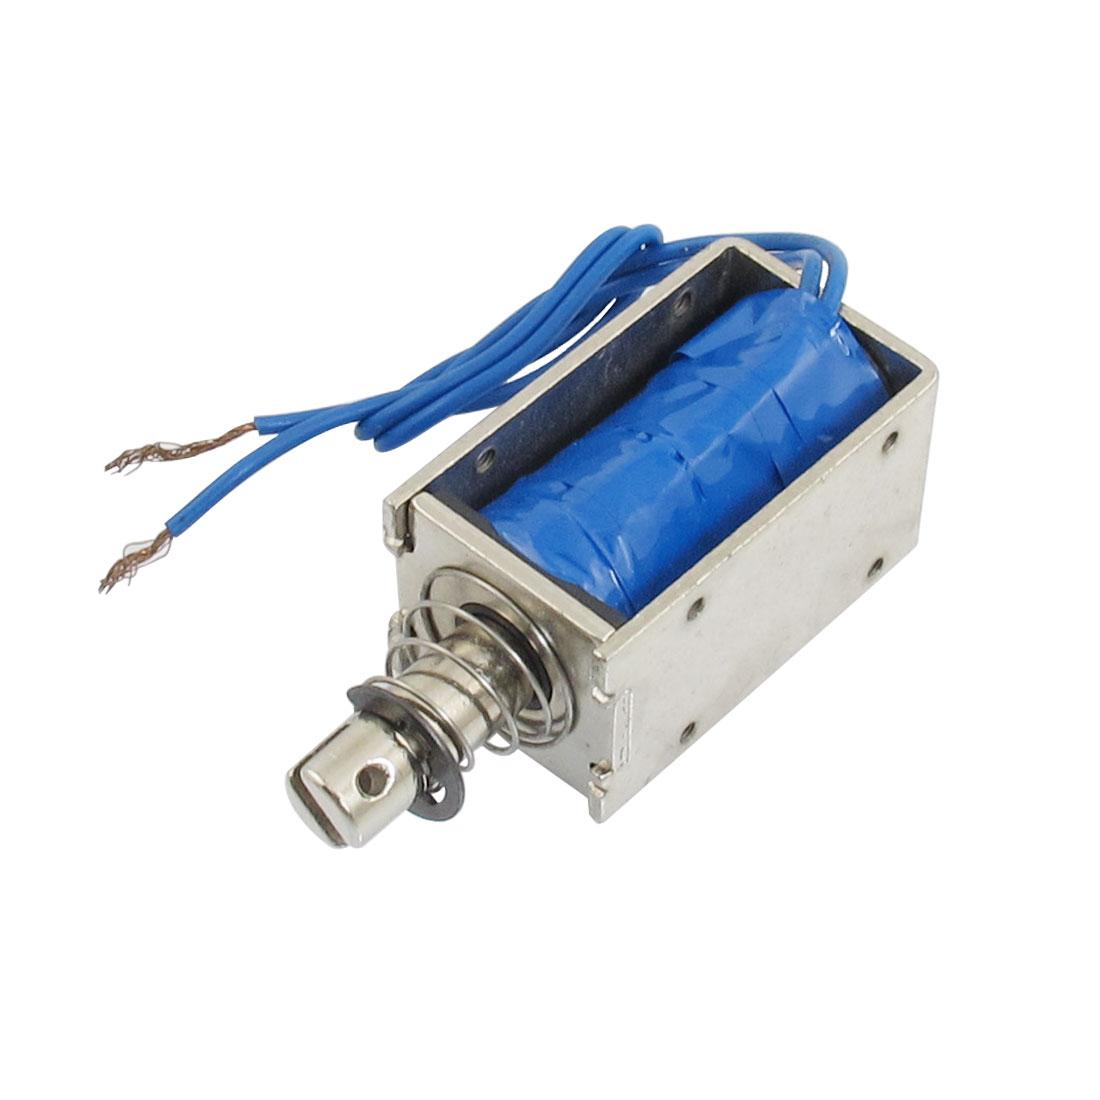 0.8Kg Holding Force Push Type Solenoid Electromagnet DC 12V 1.5A